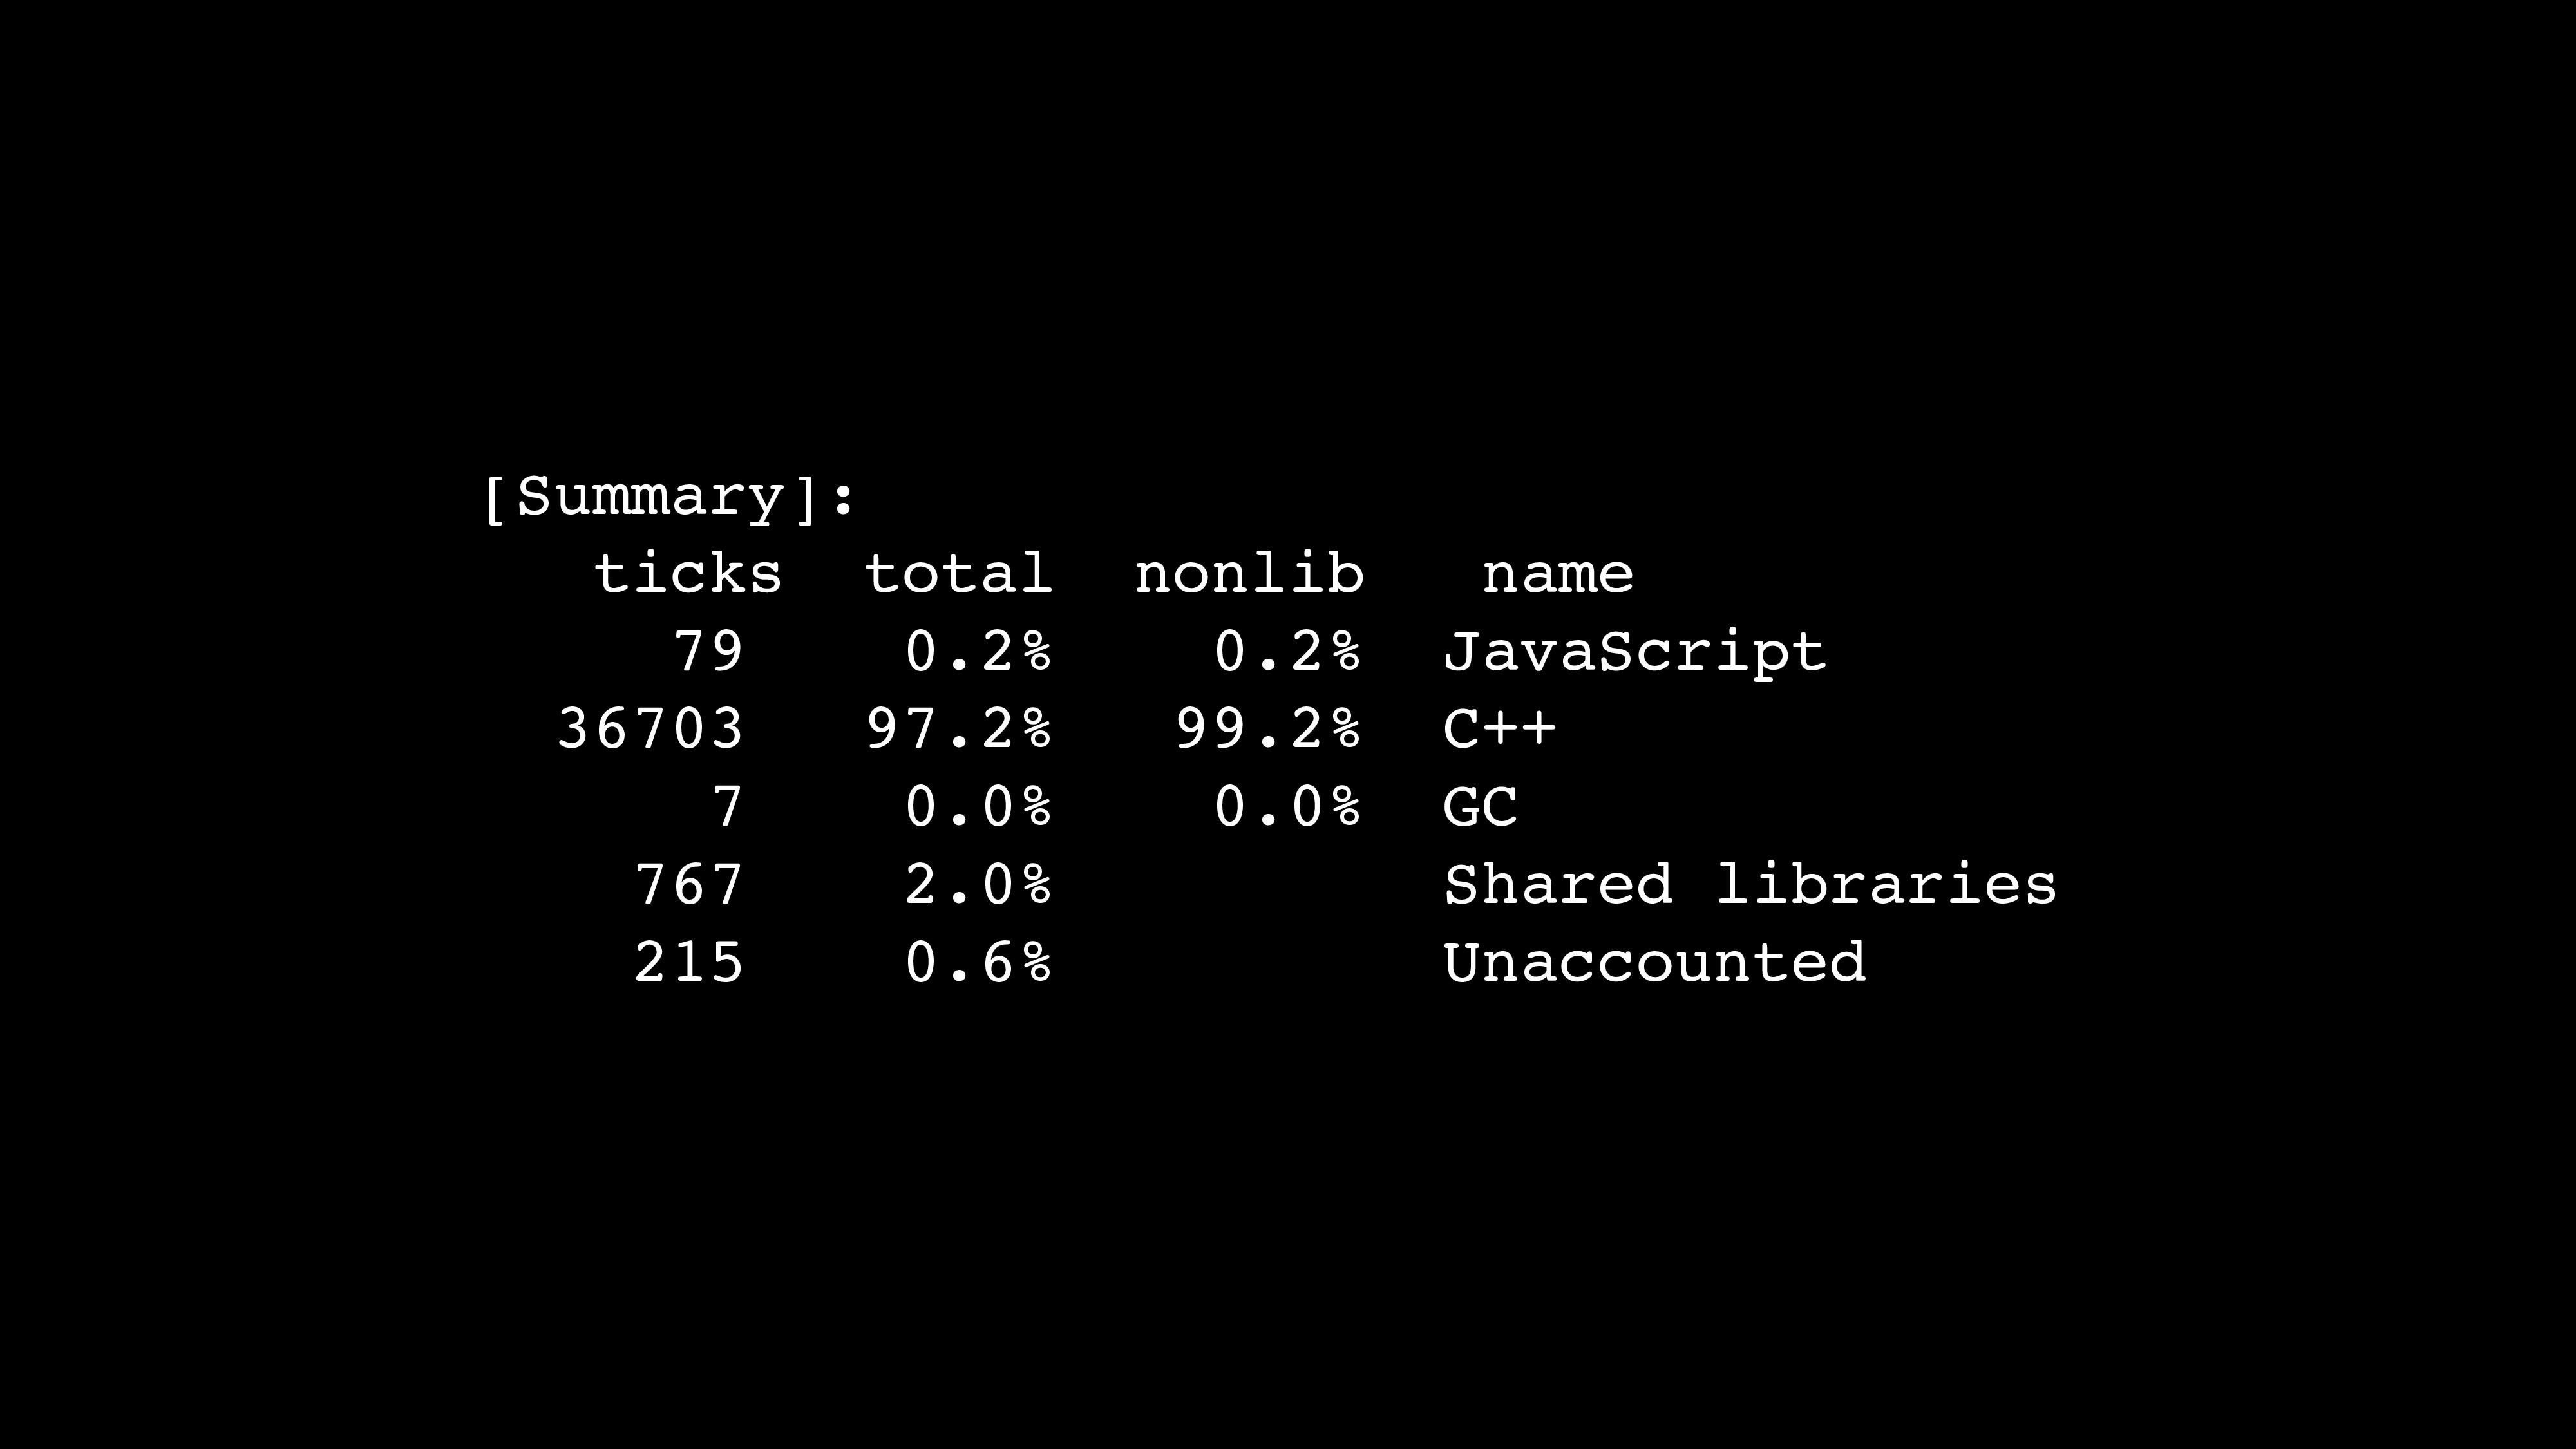 [Summary]: ticks total nonlib name 79 0.2% 0.2%...